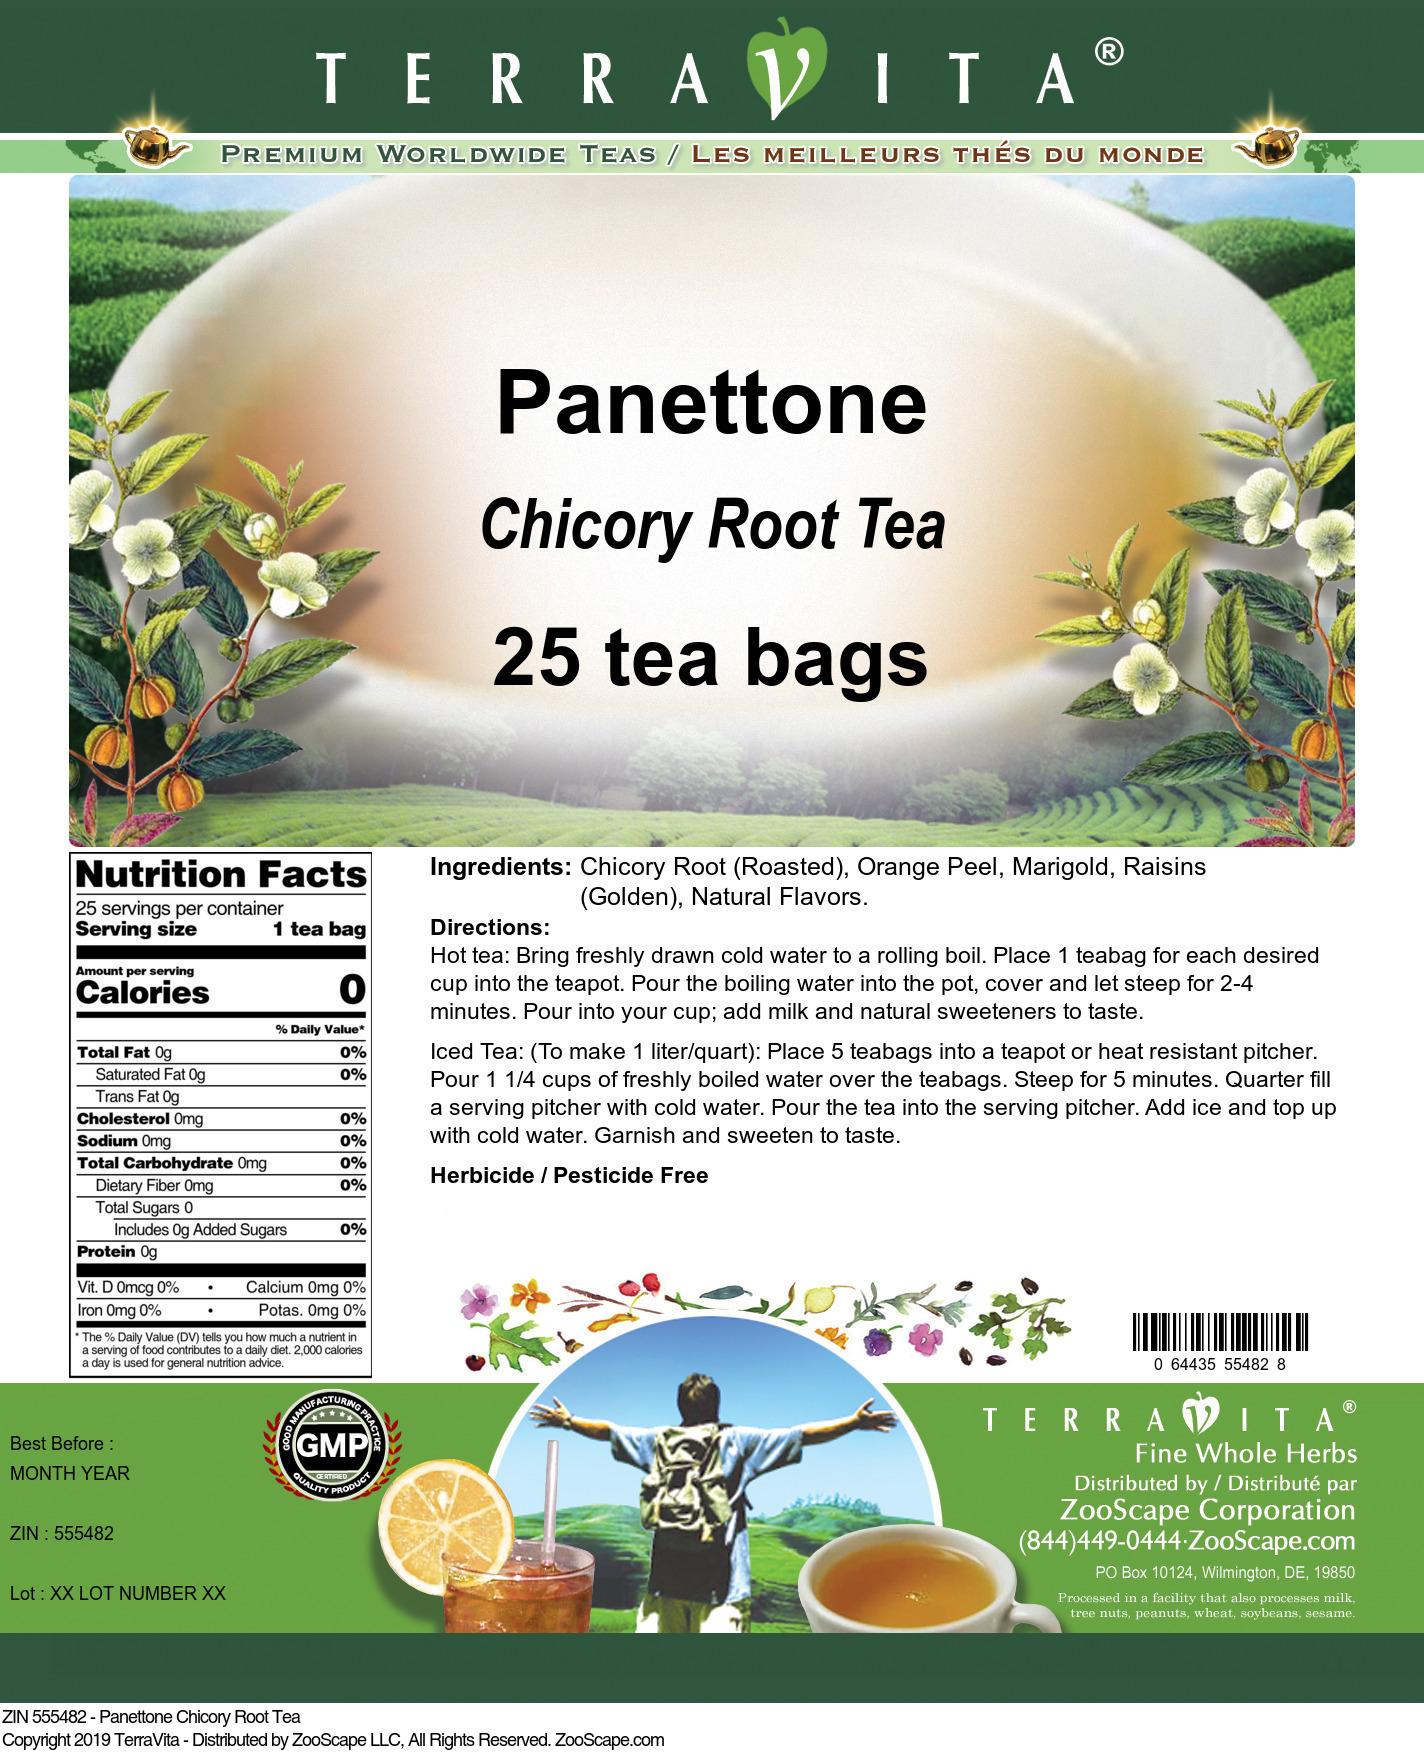 Panettone Chicory Root Tea